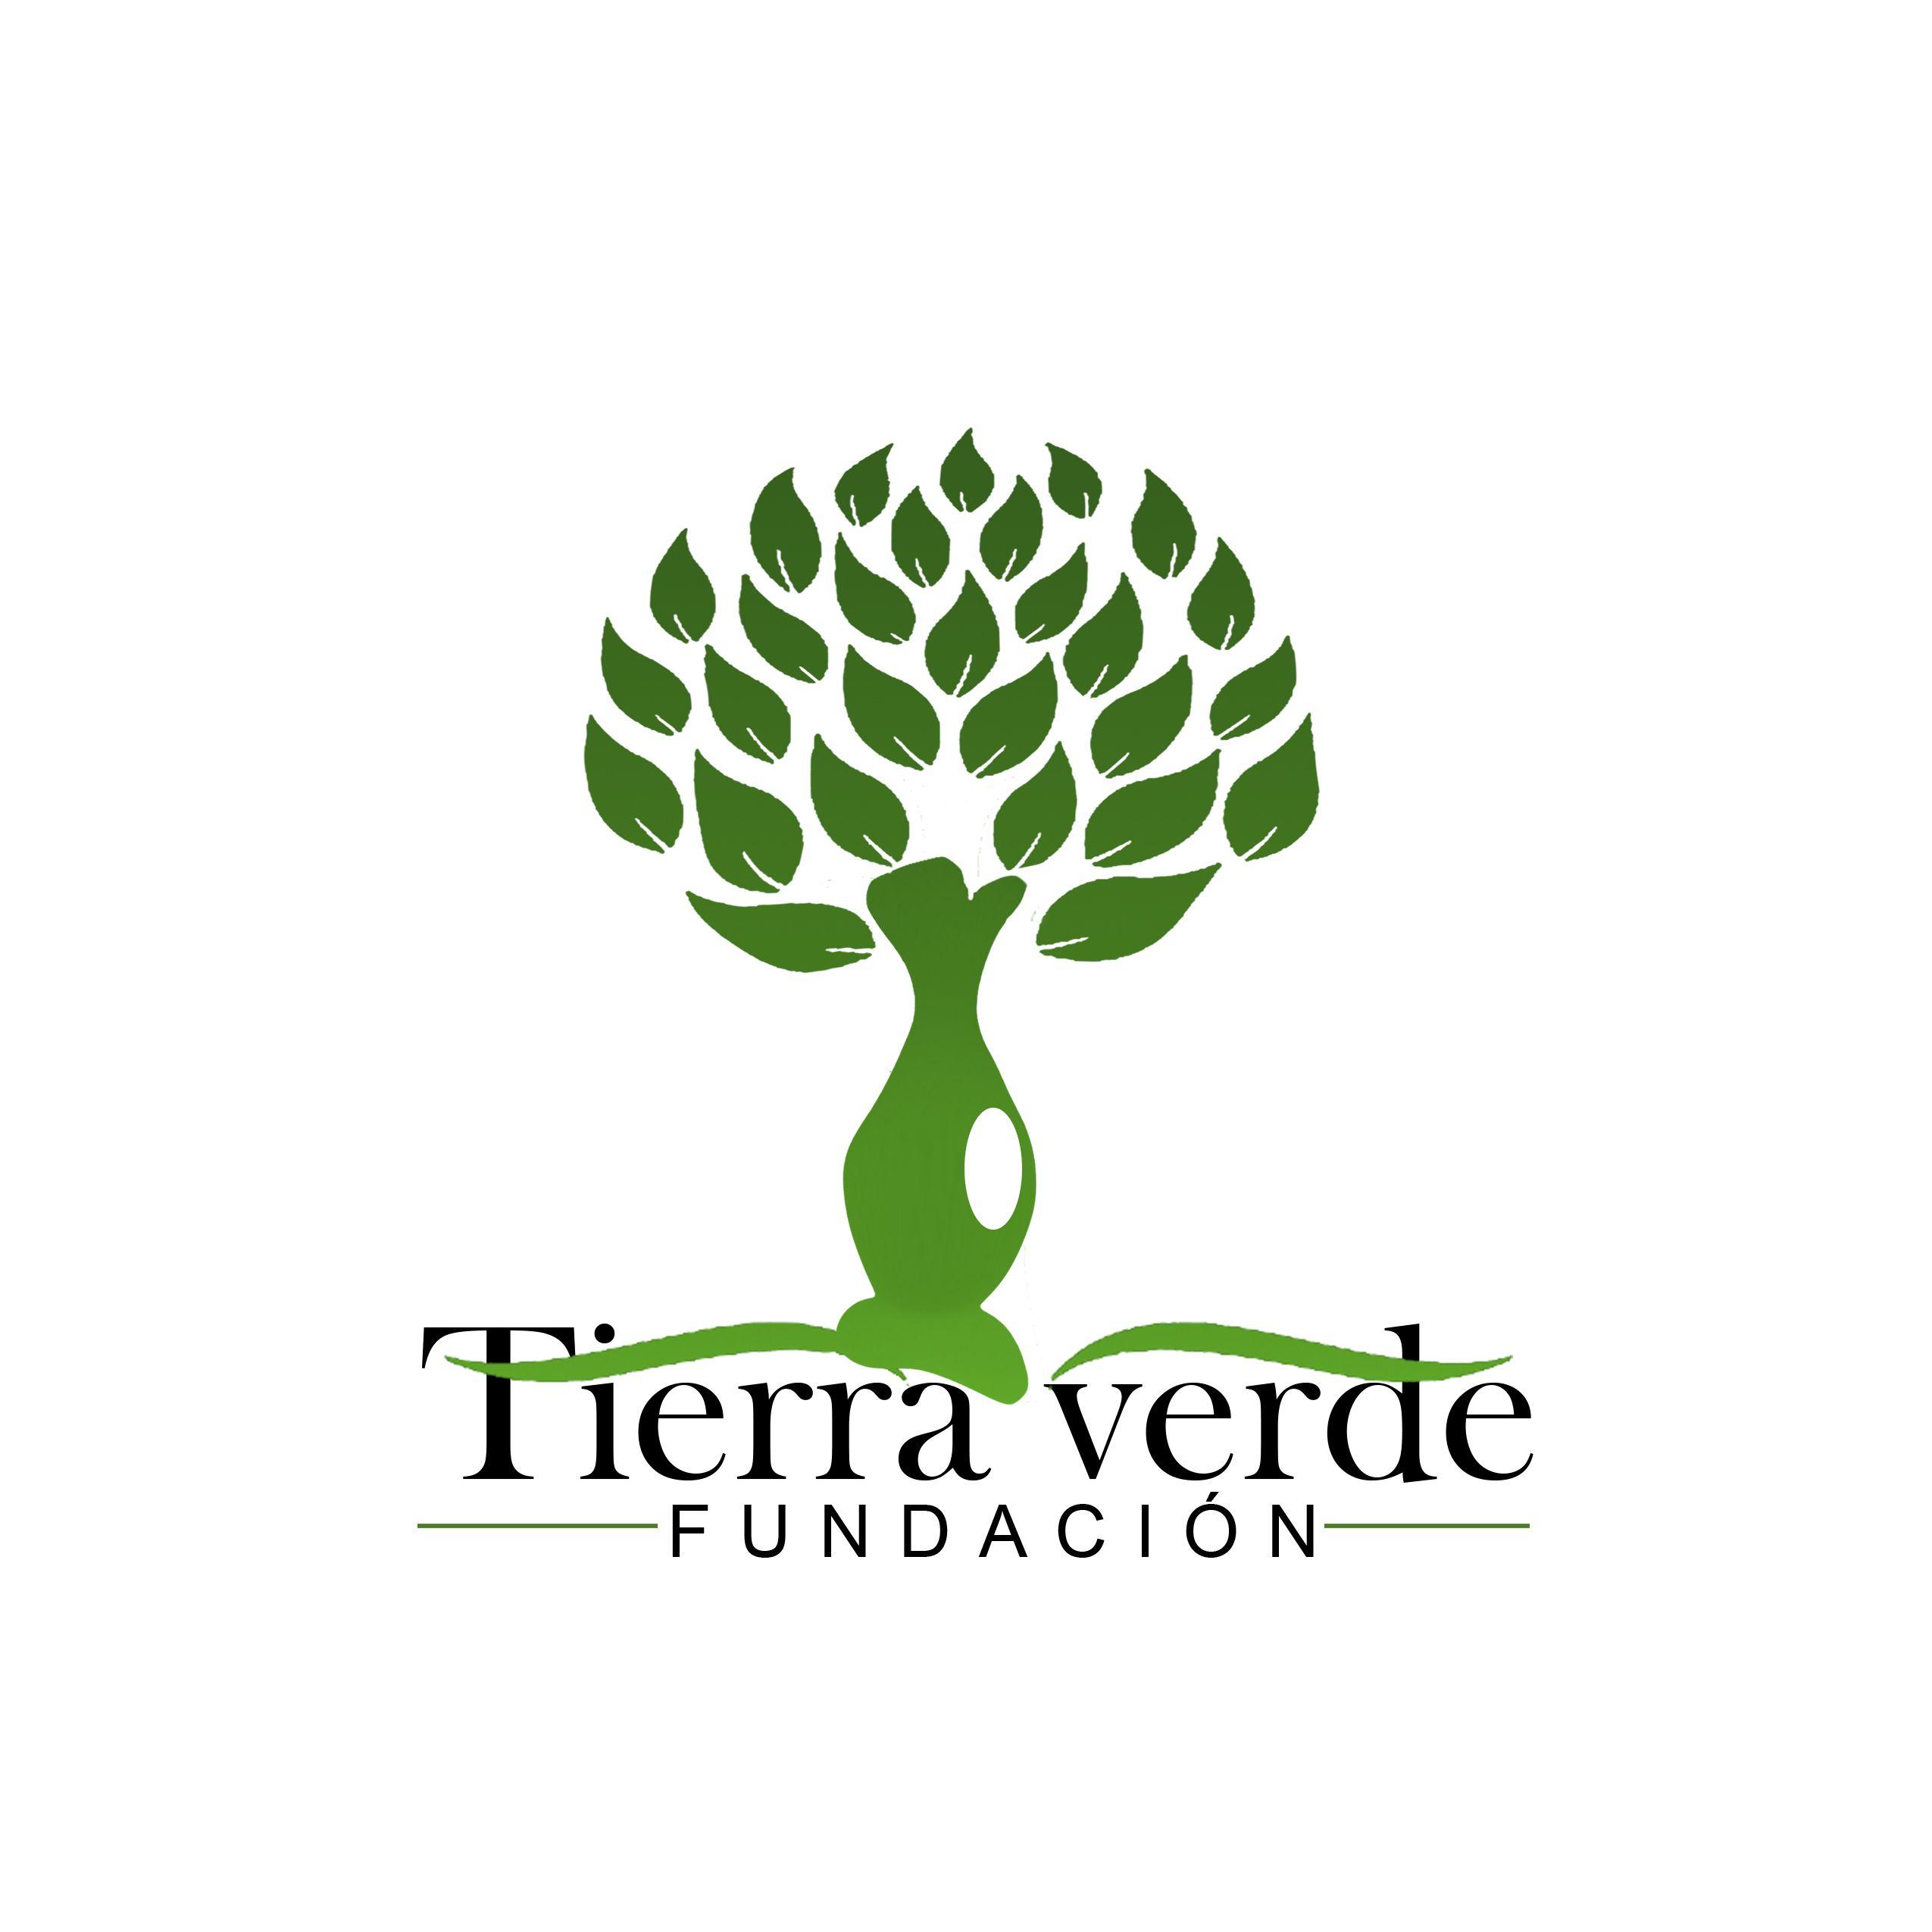 TIERRA VERDE-aarbolito.jpg (2550×2550)